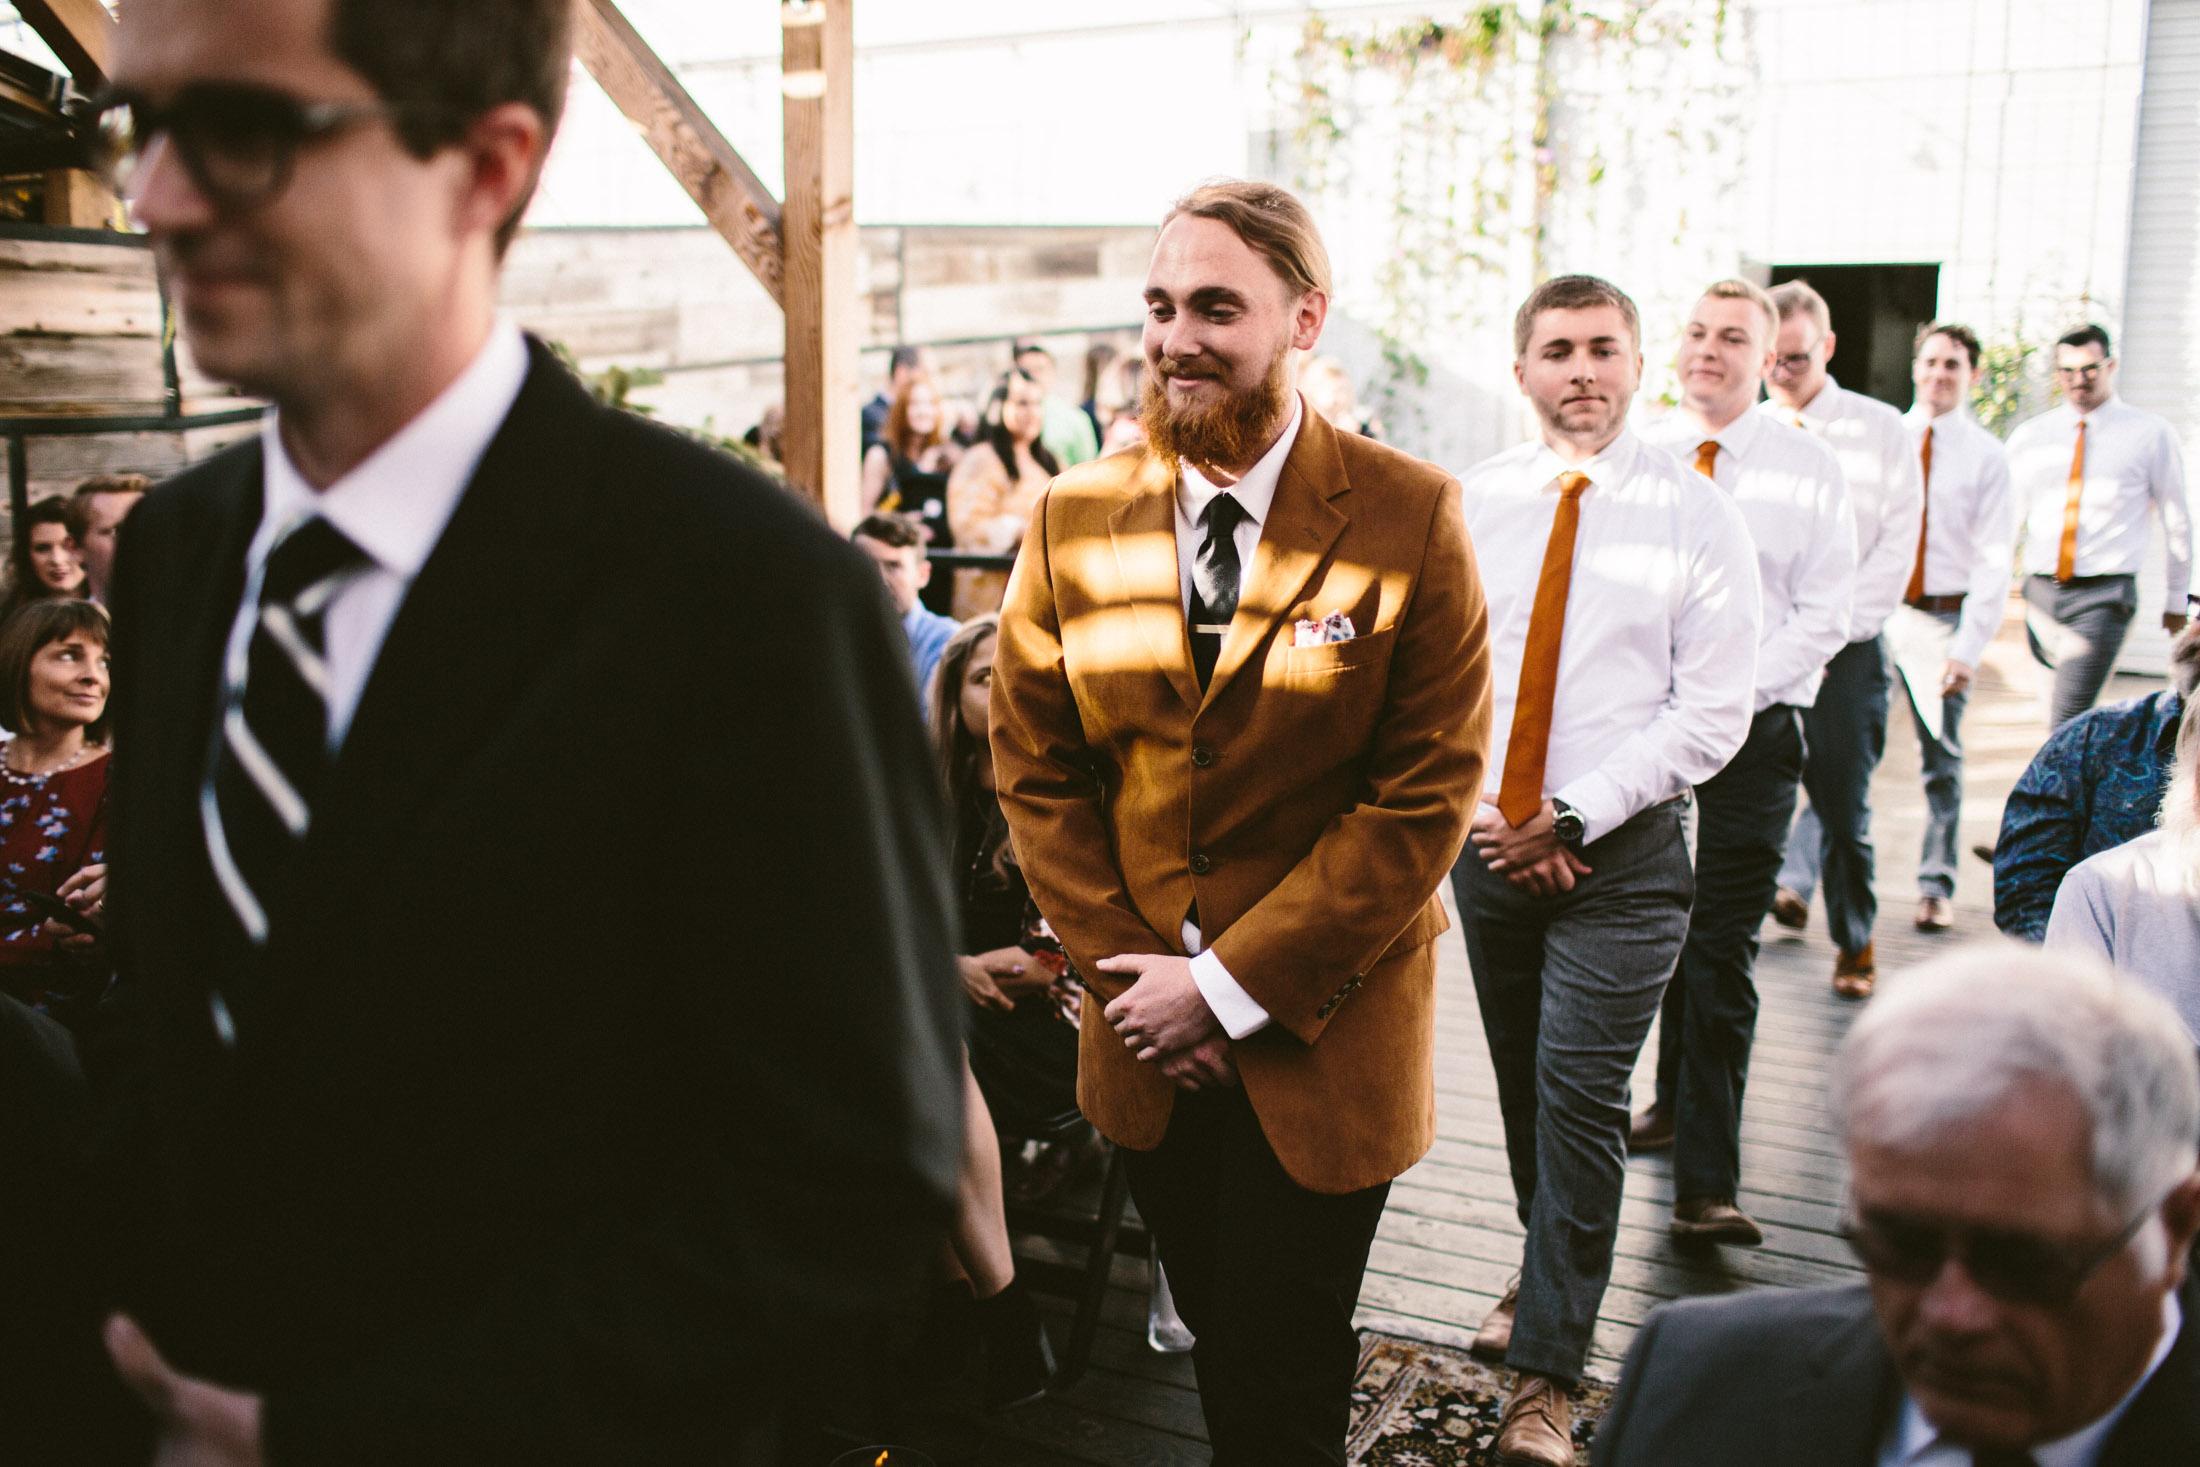 The-woodshed-booze-brothers-venue-wedding-68.jpg